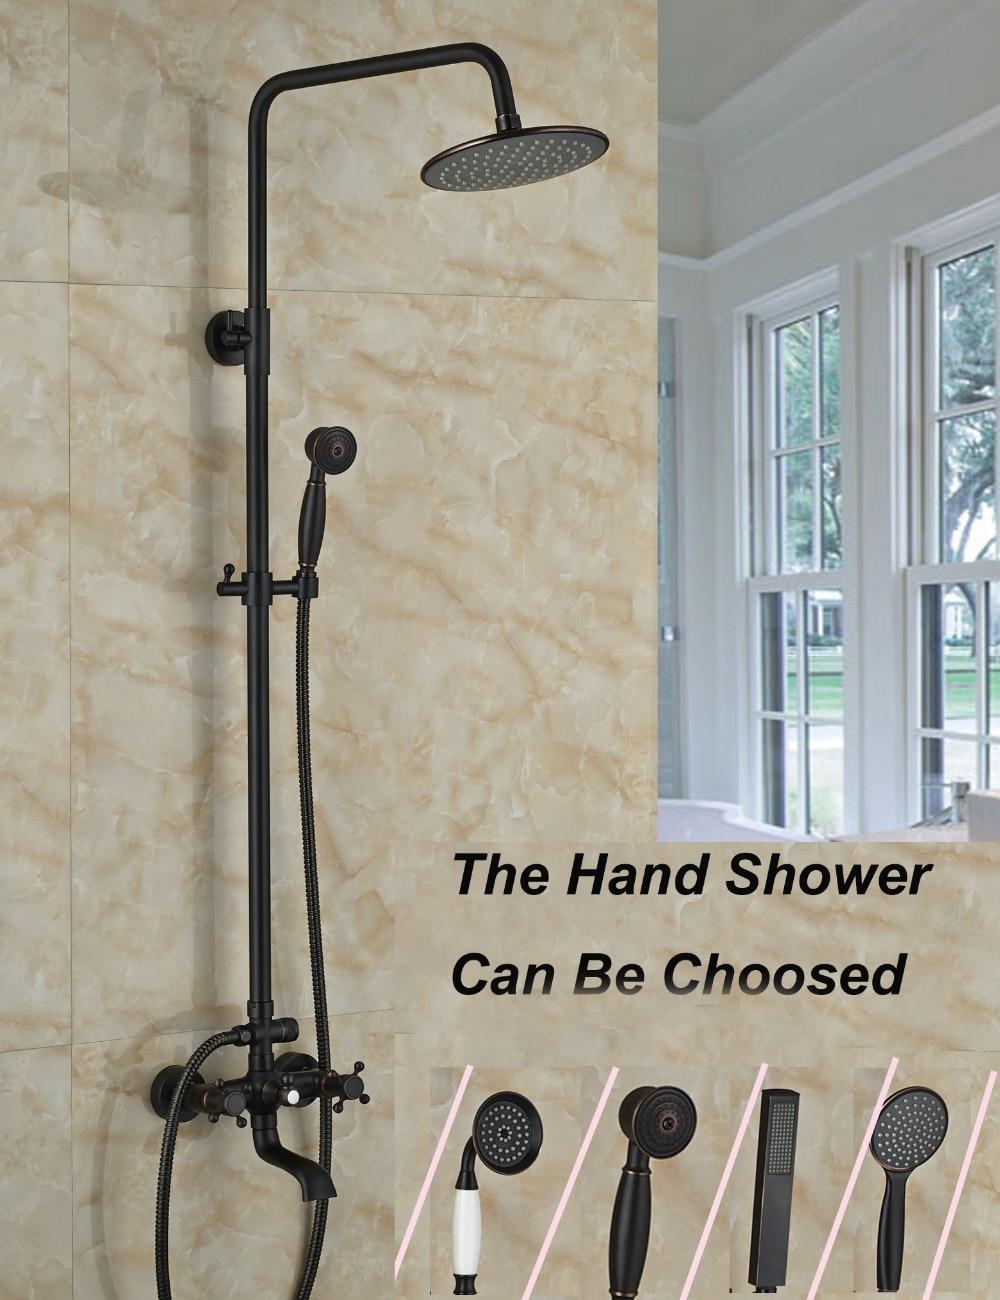 Oil Rubbed Bronze Shower Head Faucet Promotion Shop for